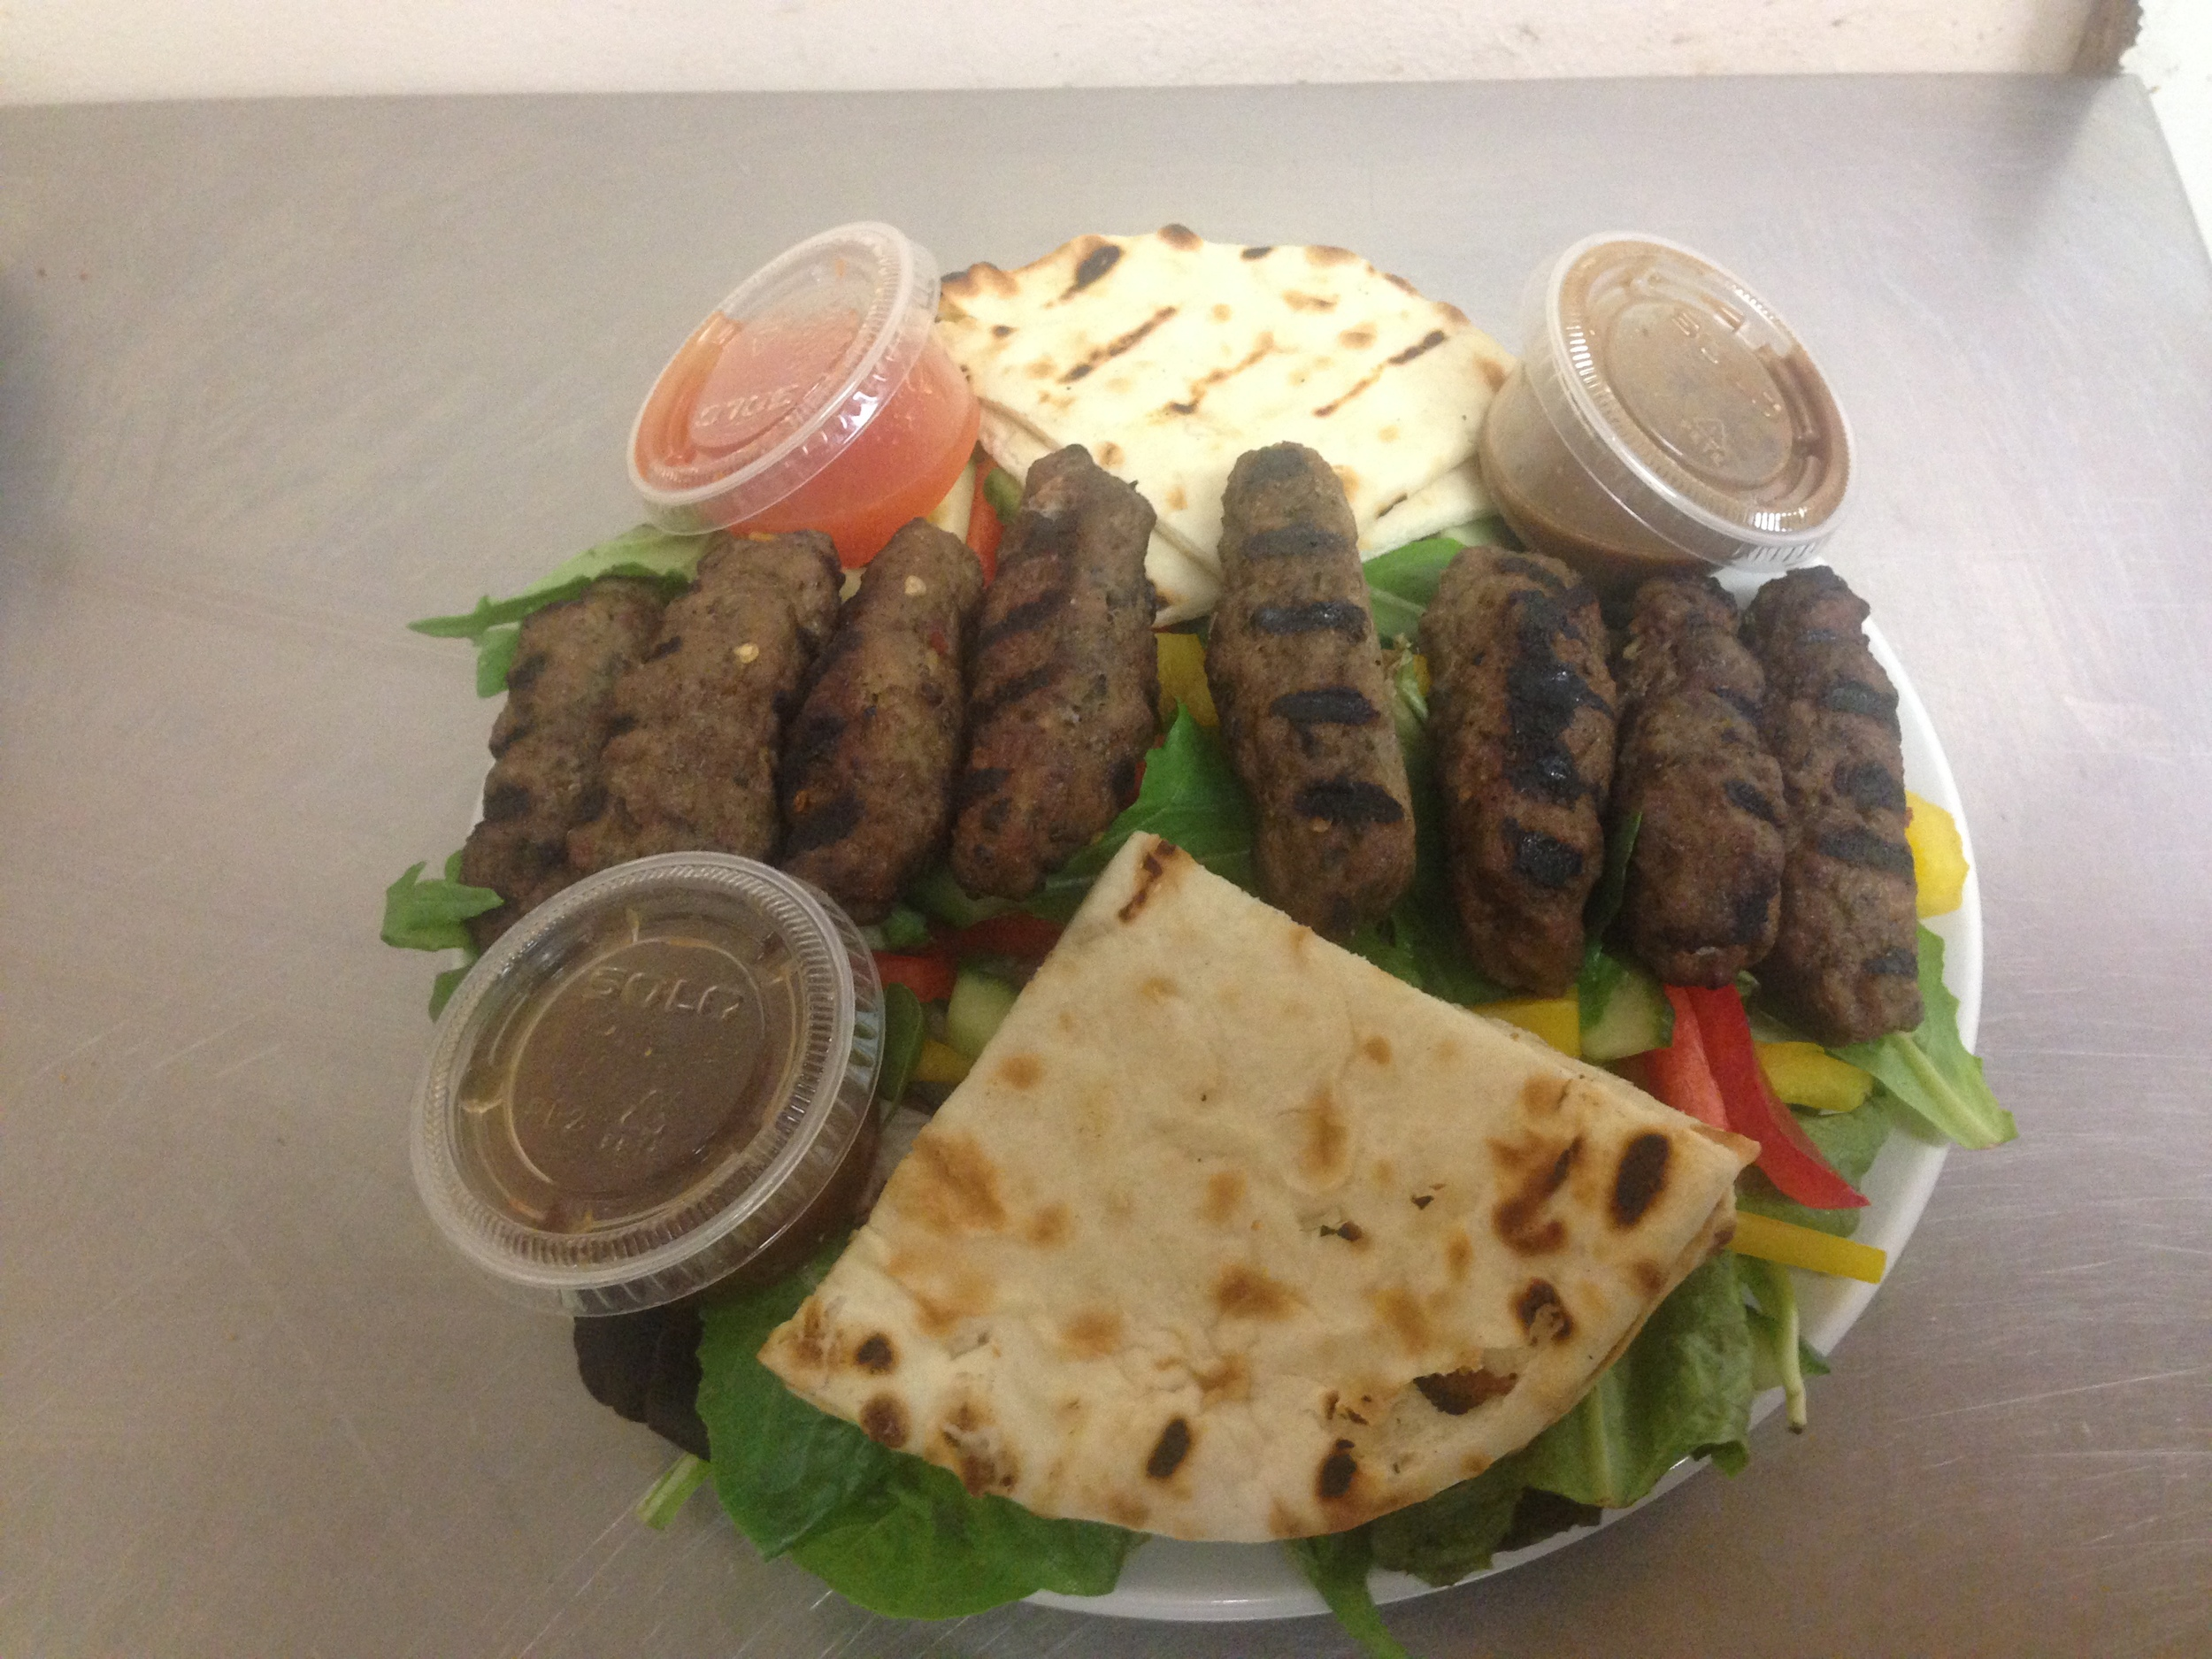 Cocktail  Seekh Kebab, naan and Salad 2